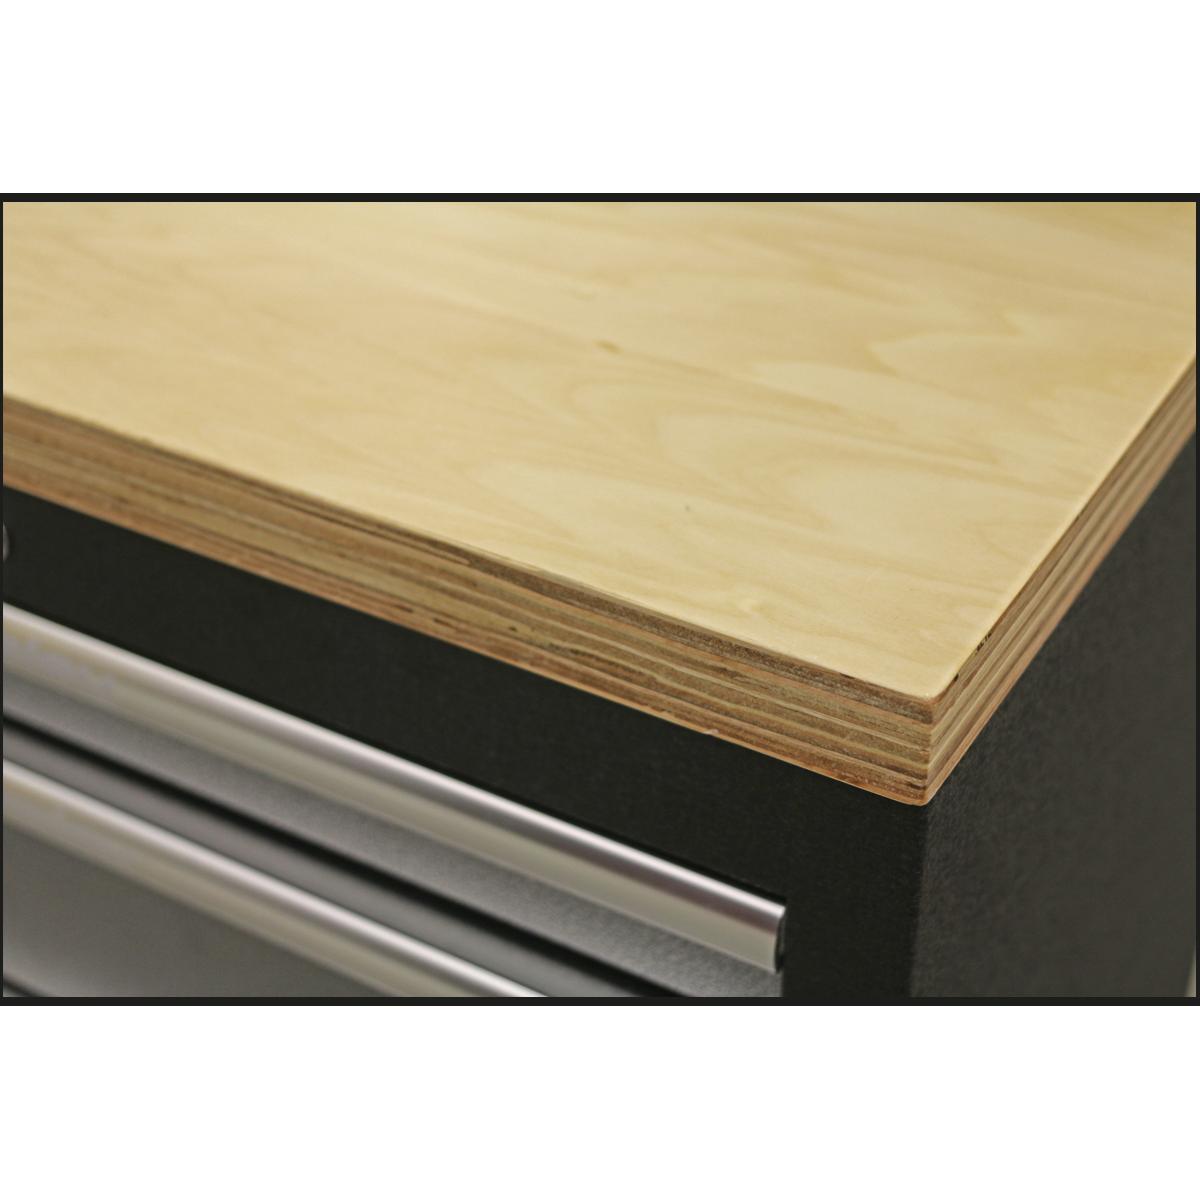 Pressed Wood Worktop 680mm Sealey Apms50wa By Sealey 5057719078535 Ebay